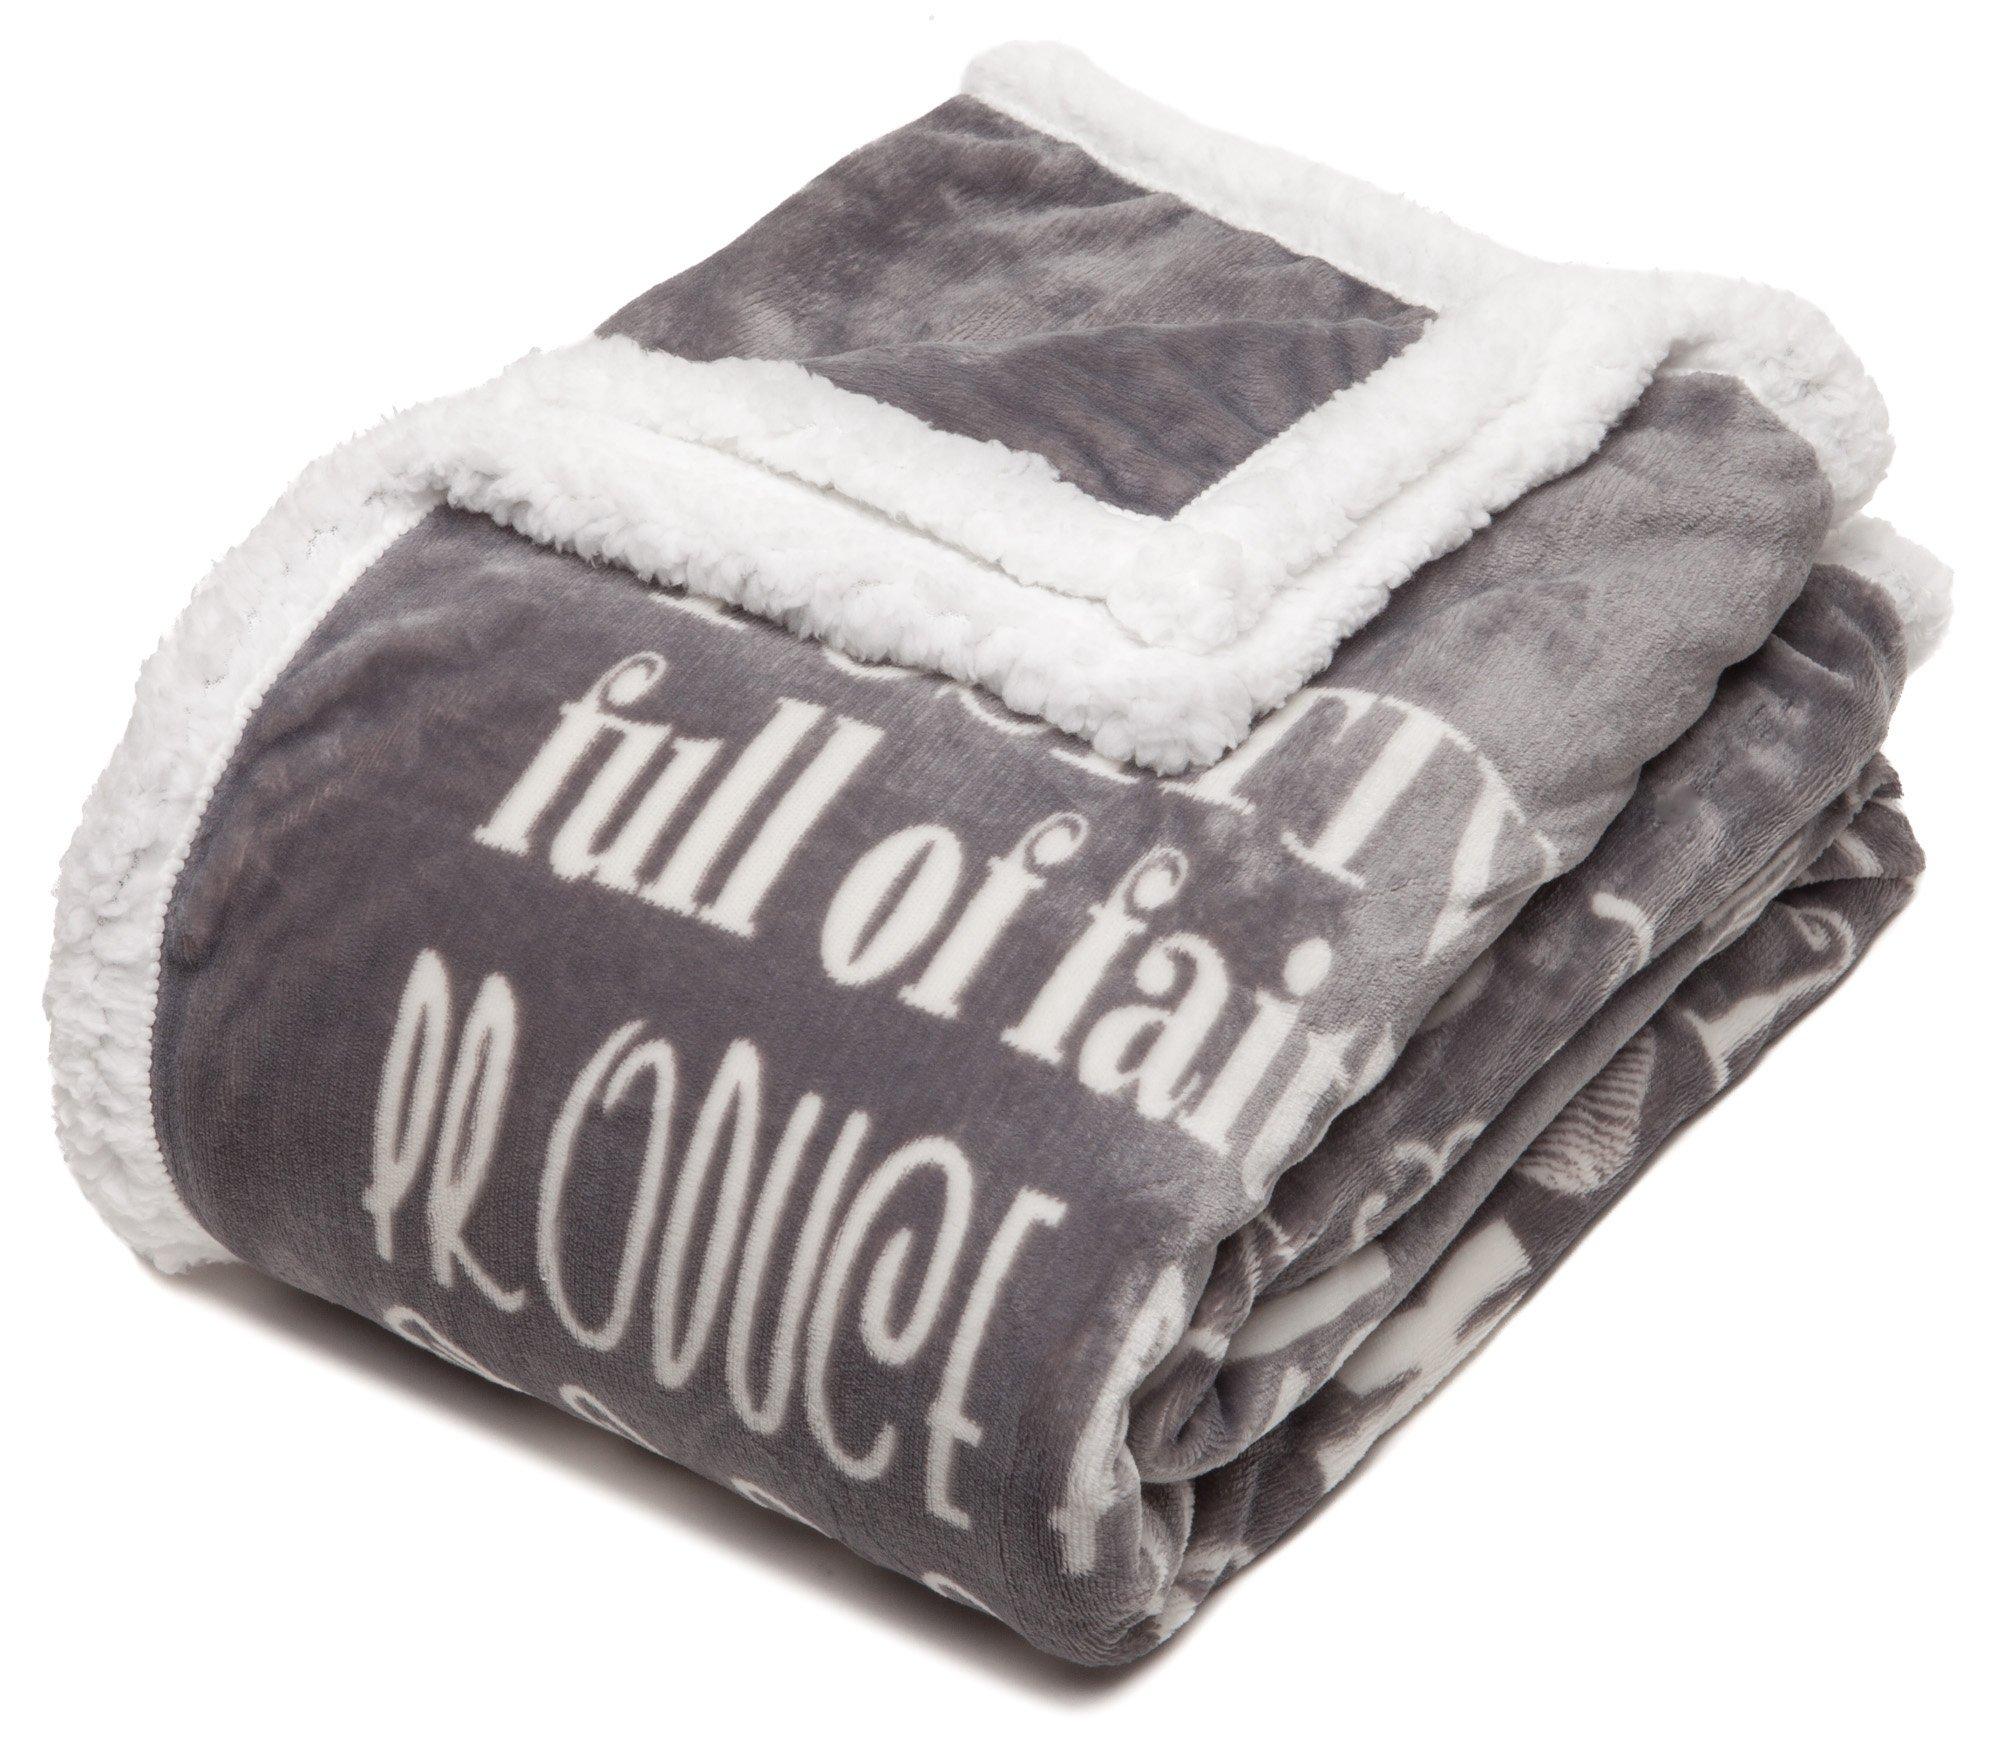 Chanasya Hope and Faith Inspirational Message Print Super Soft Ultra Plush Cozy Fleece Microfiber Sherpa Posivite Energy Comfort Caring Uplifting Gift Throw Blanket - for Women Men - Grey Blanket by Chanasya (Image #6)